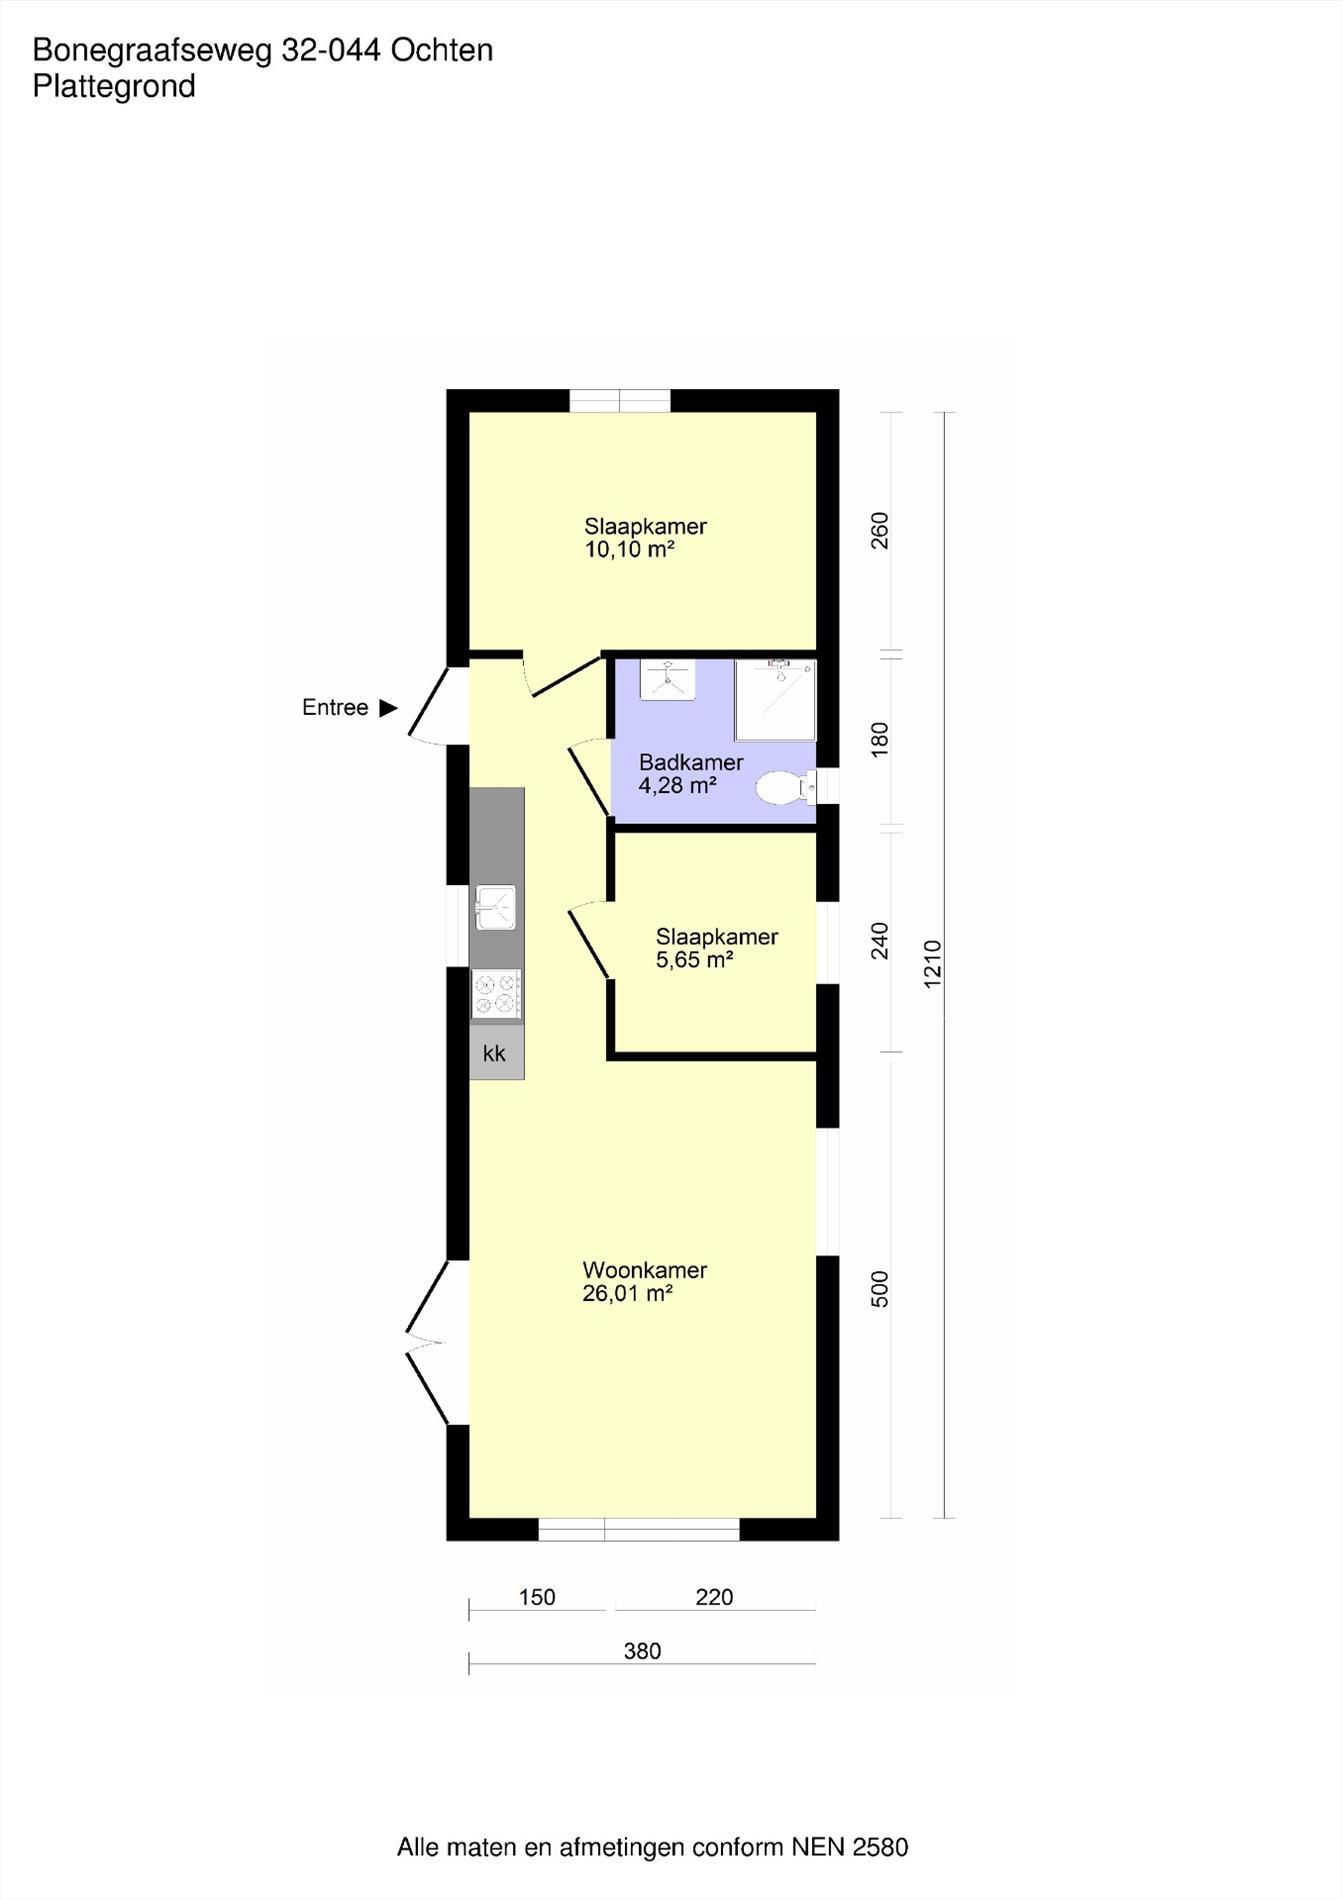 Floorplan - Bonegraafseweg 32-044, 4051 CH Ochten